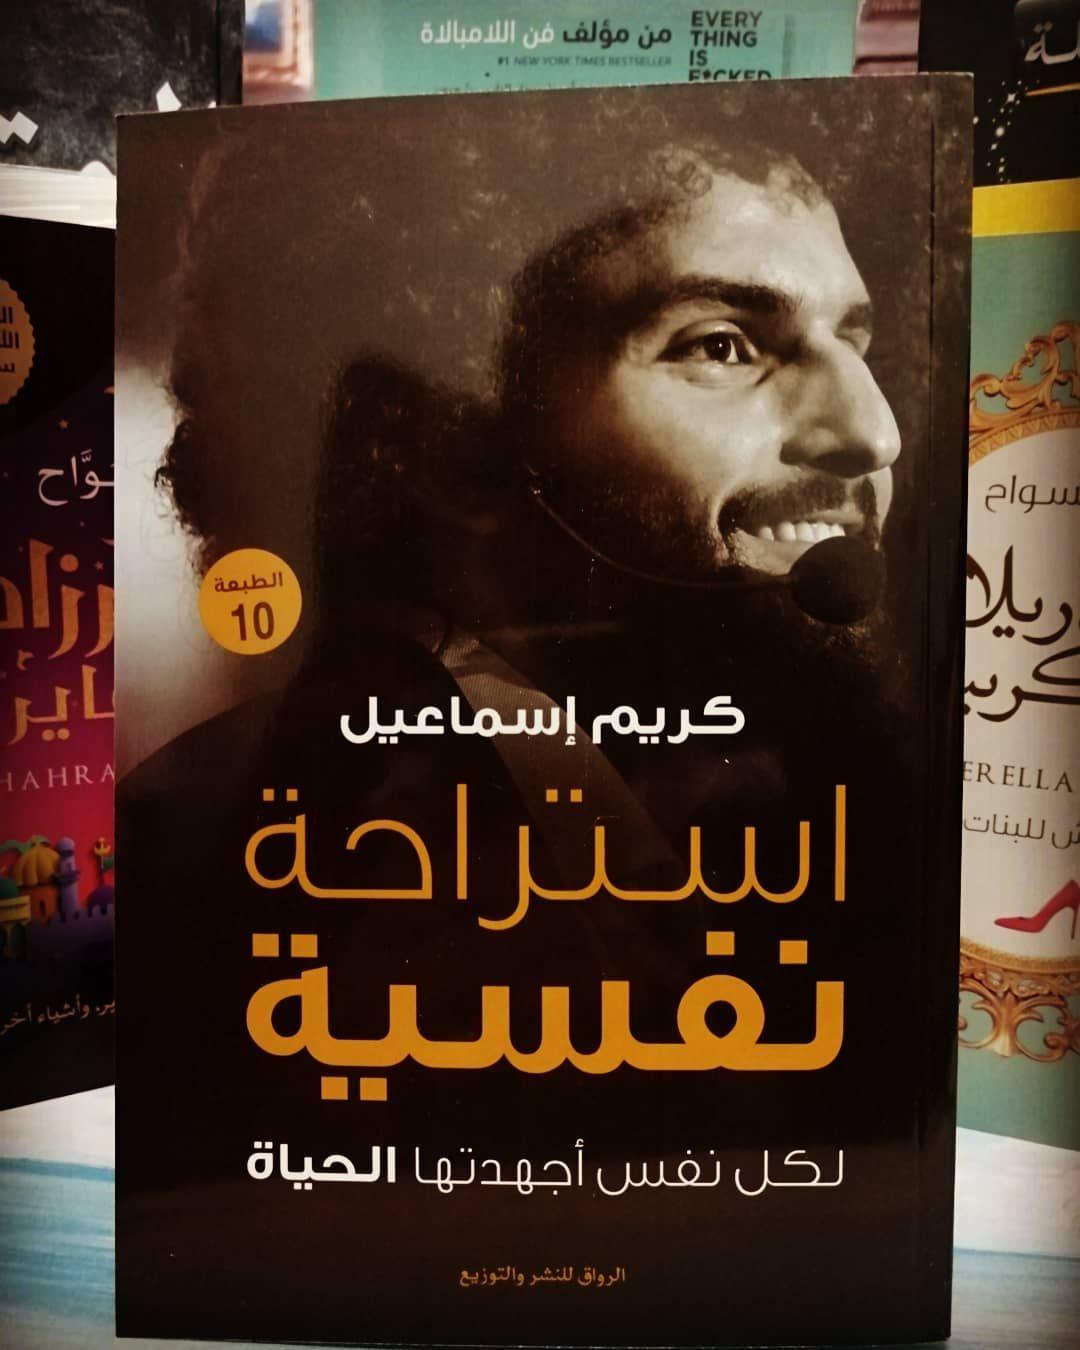 Pin By منوعات مفيدة On كتب عالمية Books Book Cover Movie Posters